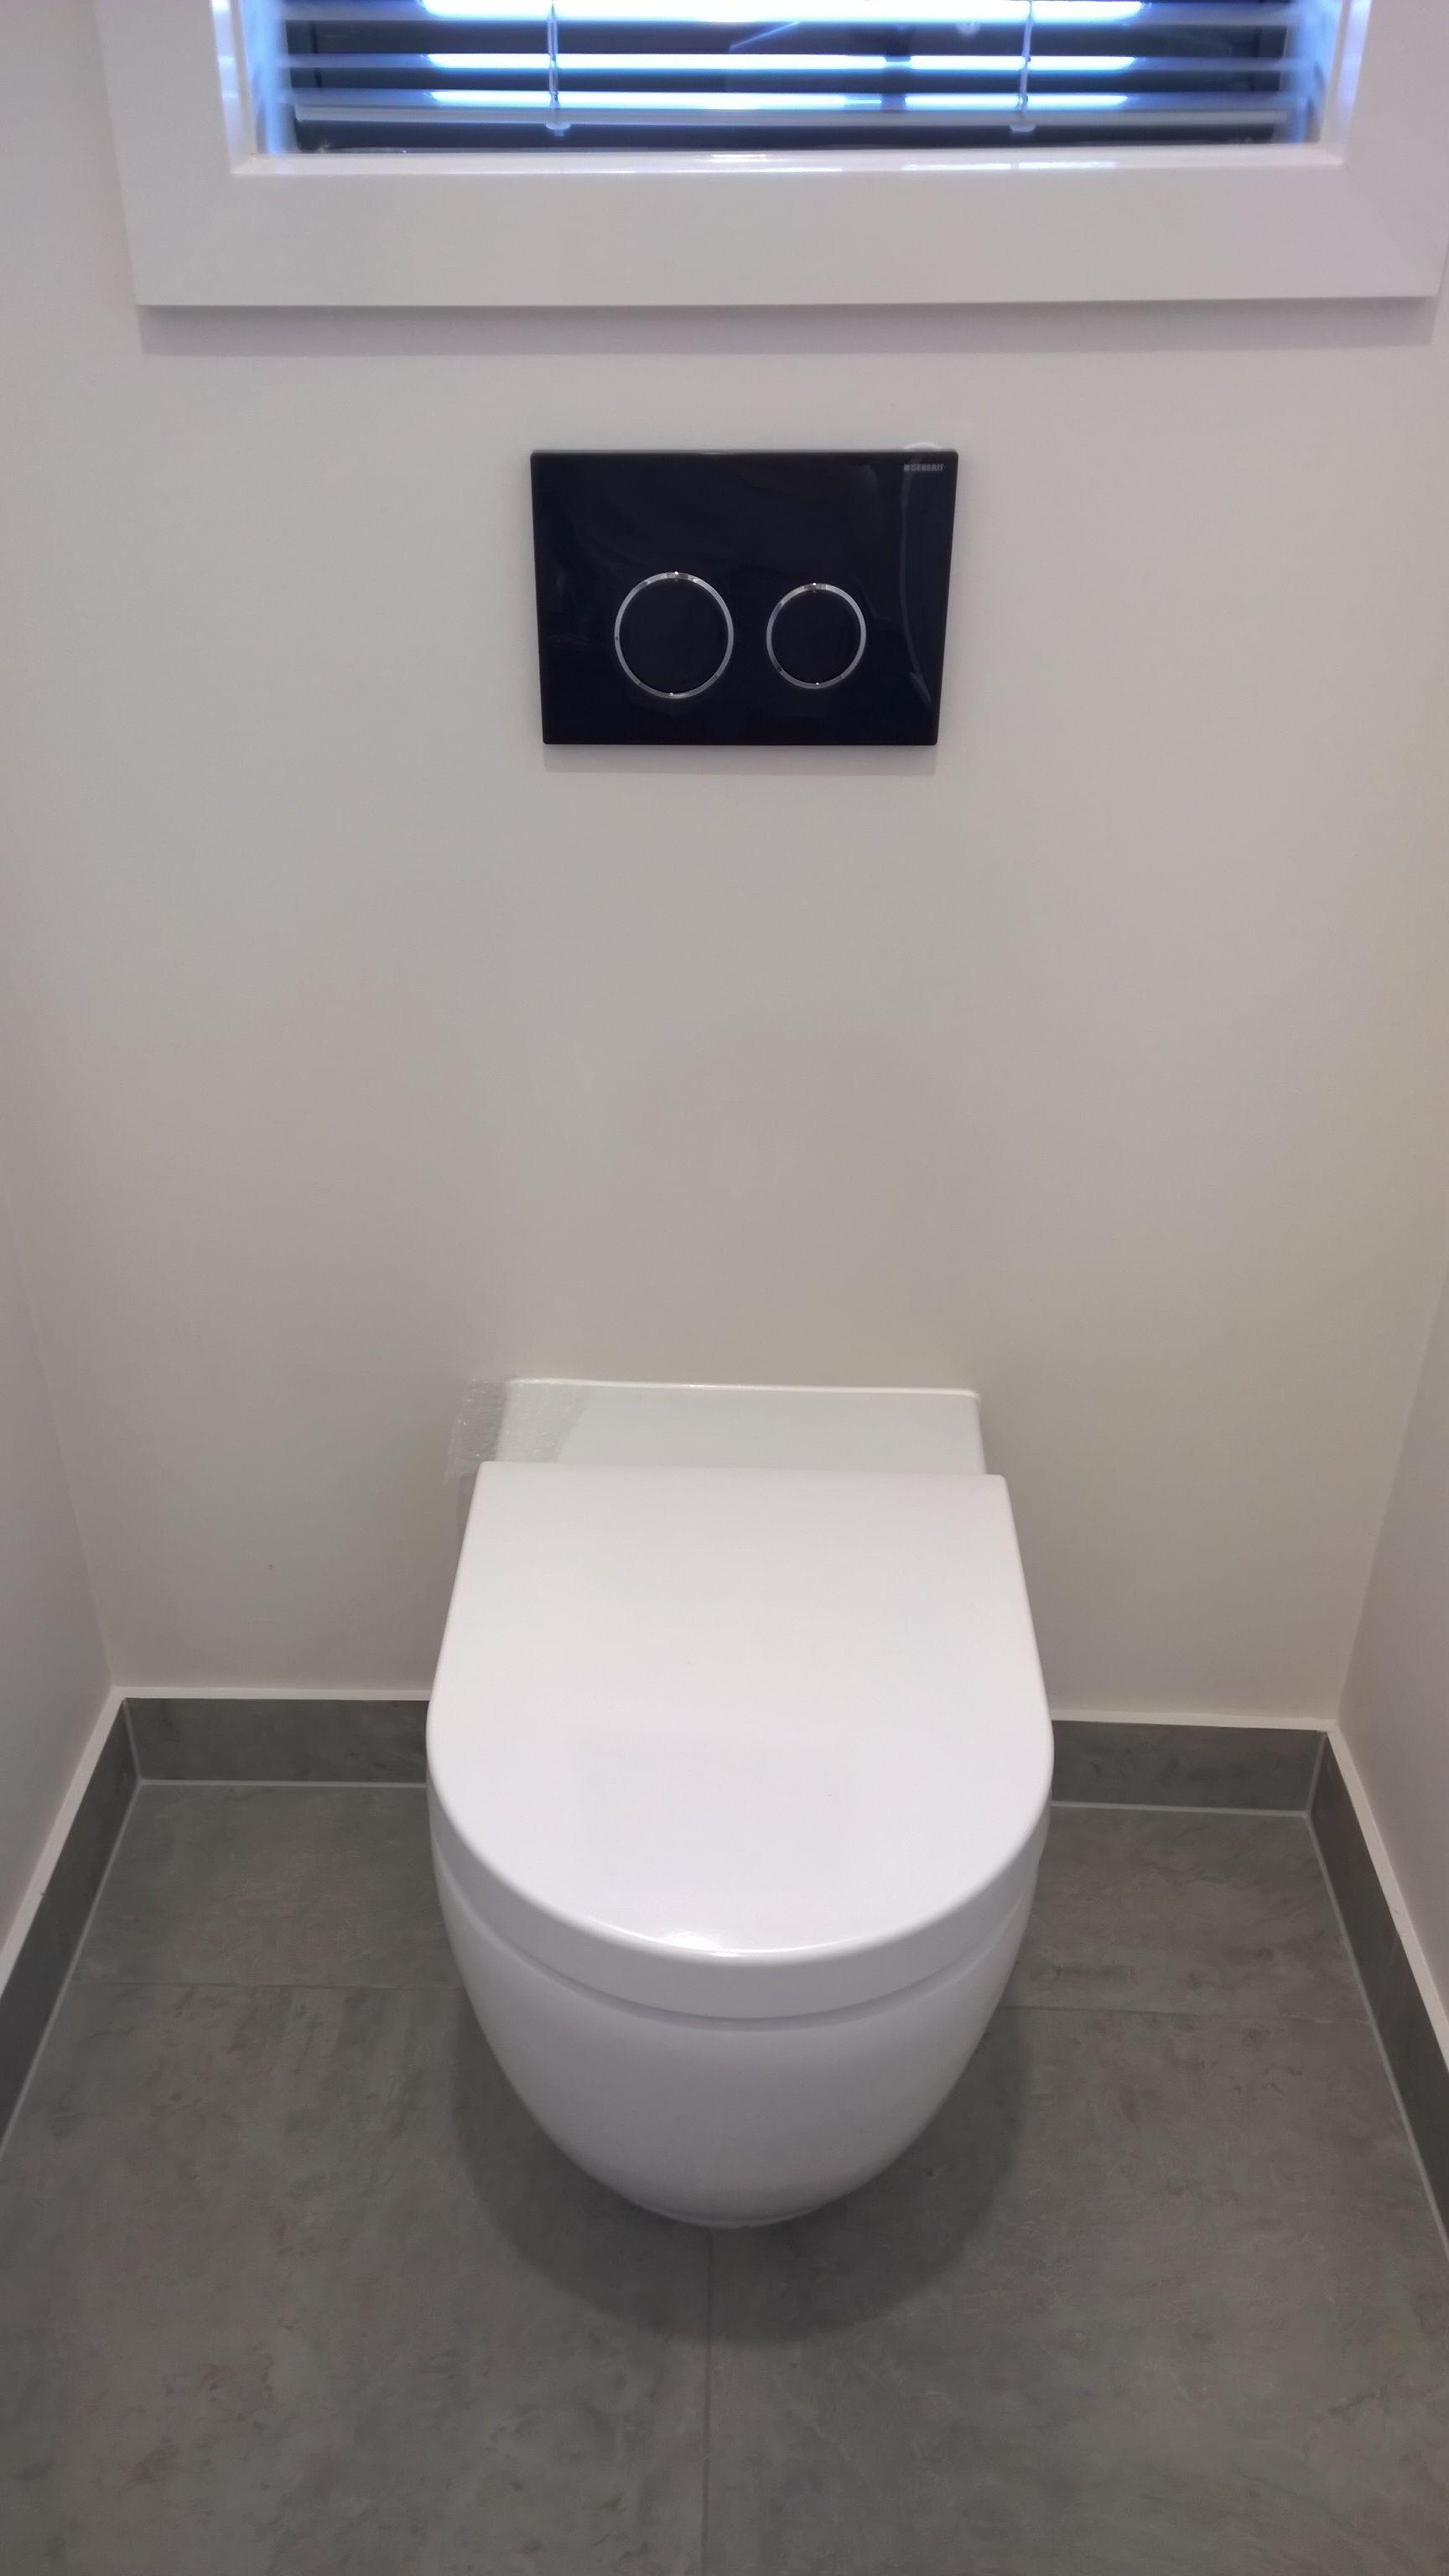 Black Toilet Flushing Buttons Black Toilet Toilet Flush Toilet